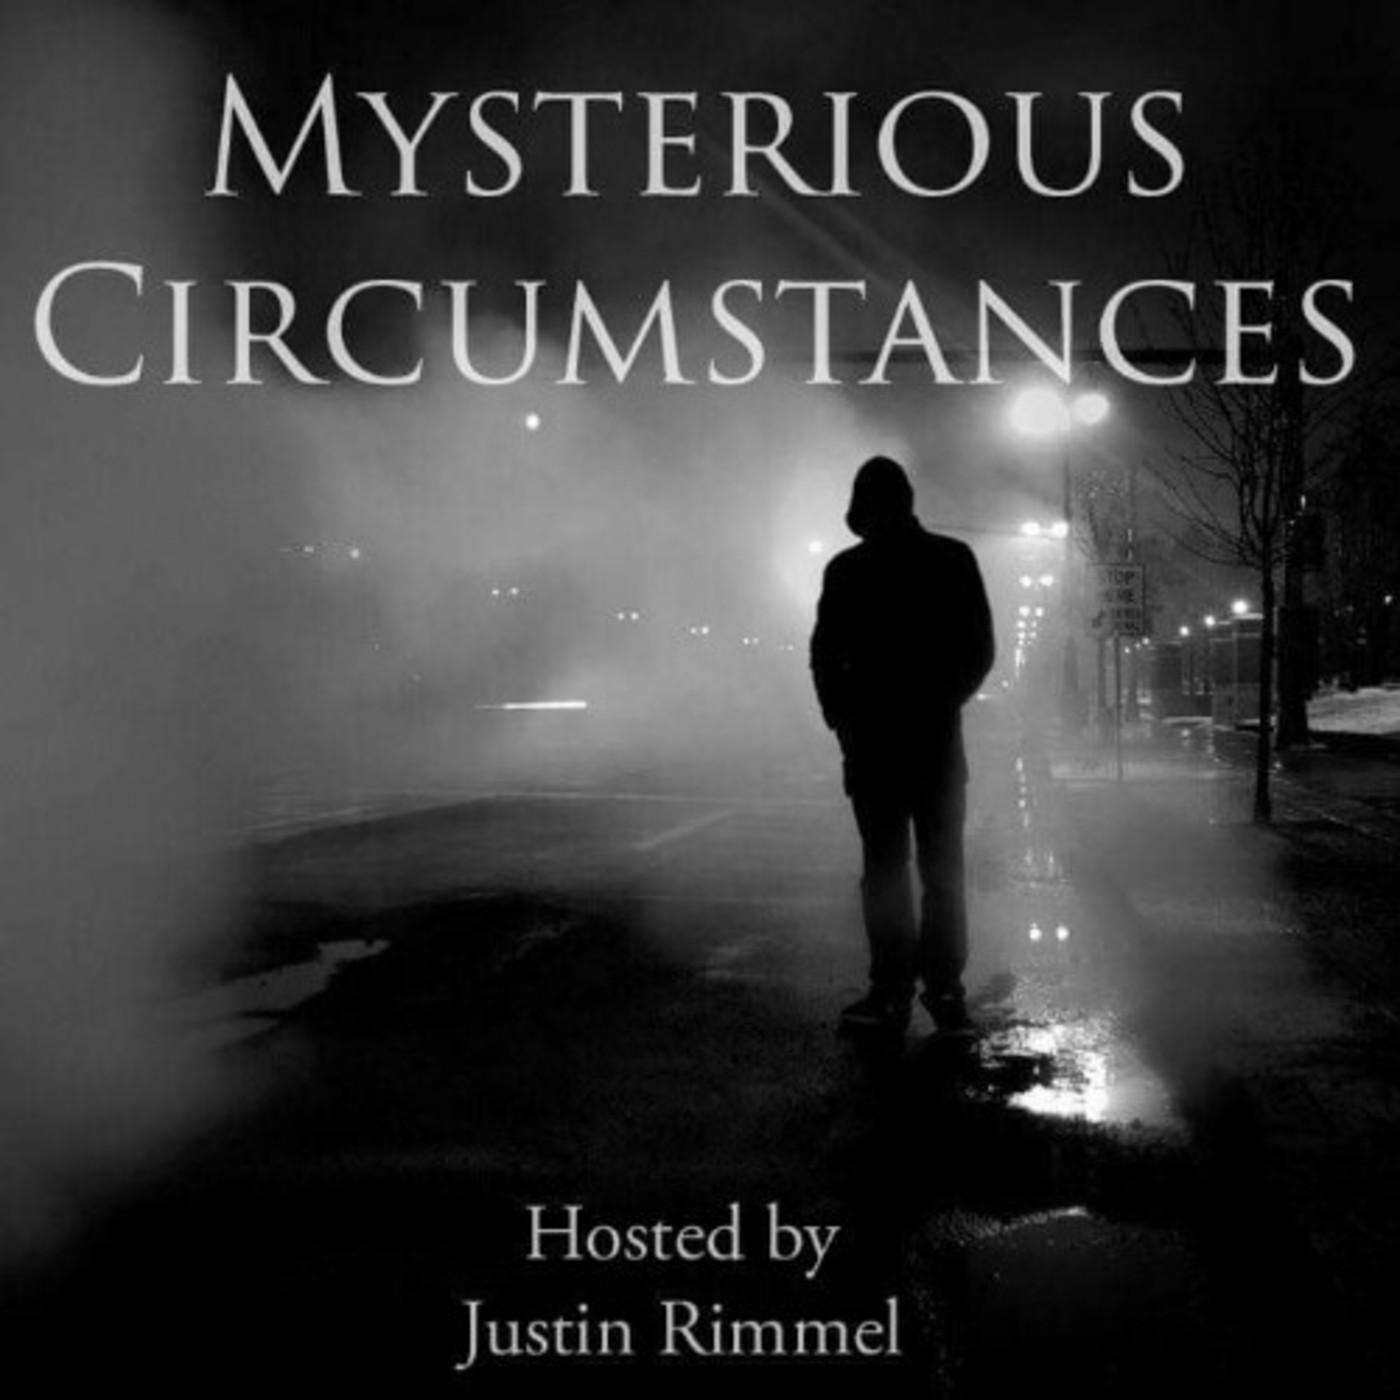 Mysterious Circumstances Podcast - The Bible Belt Strangler